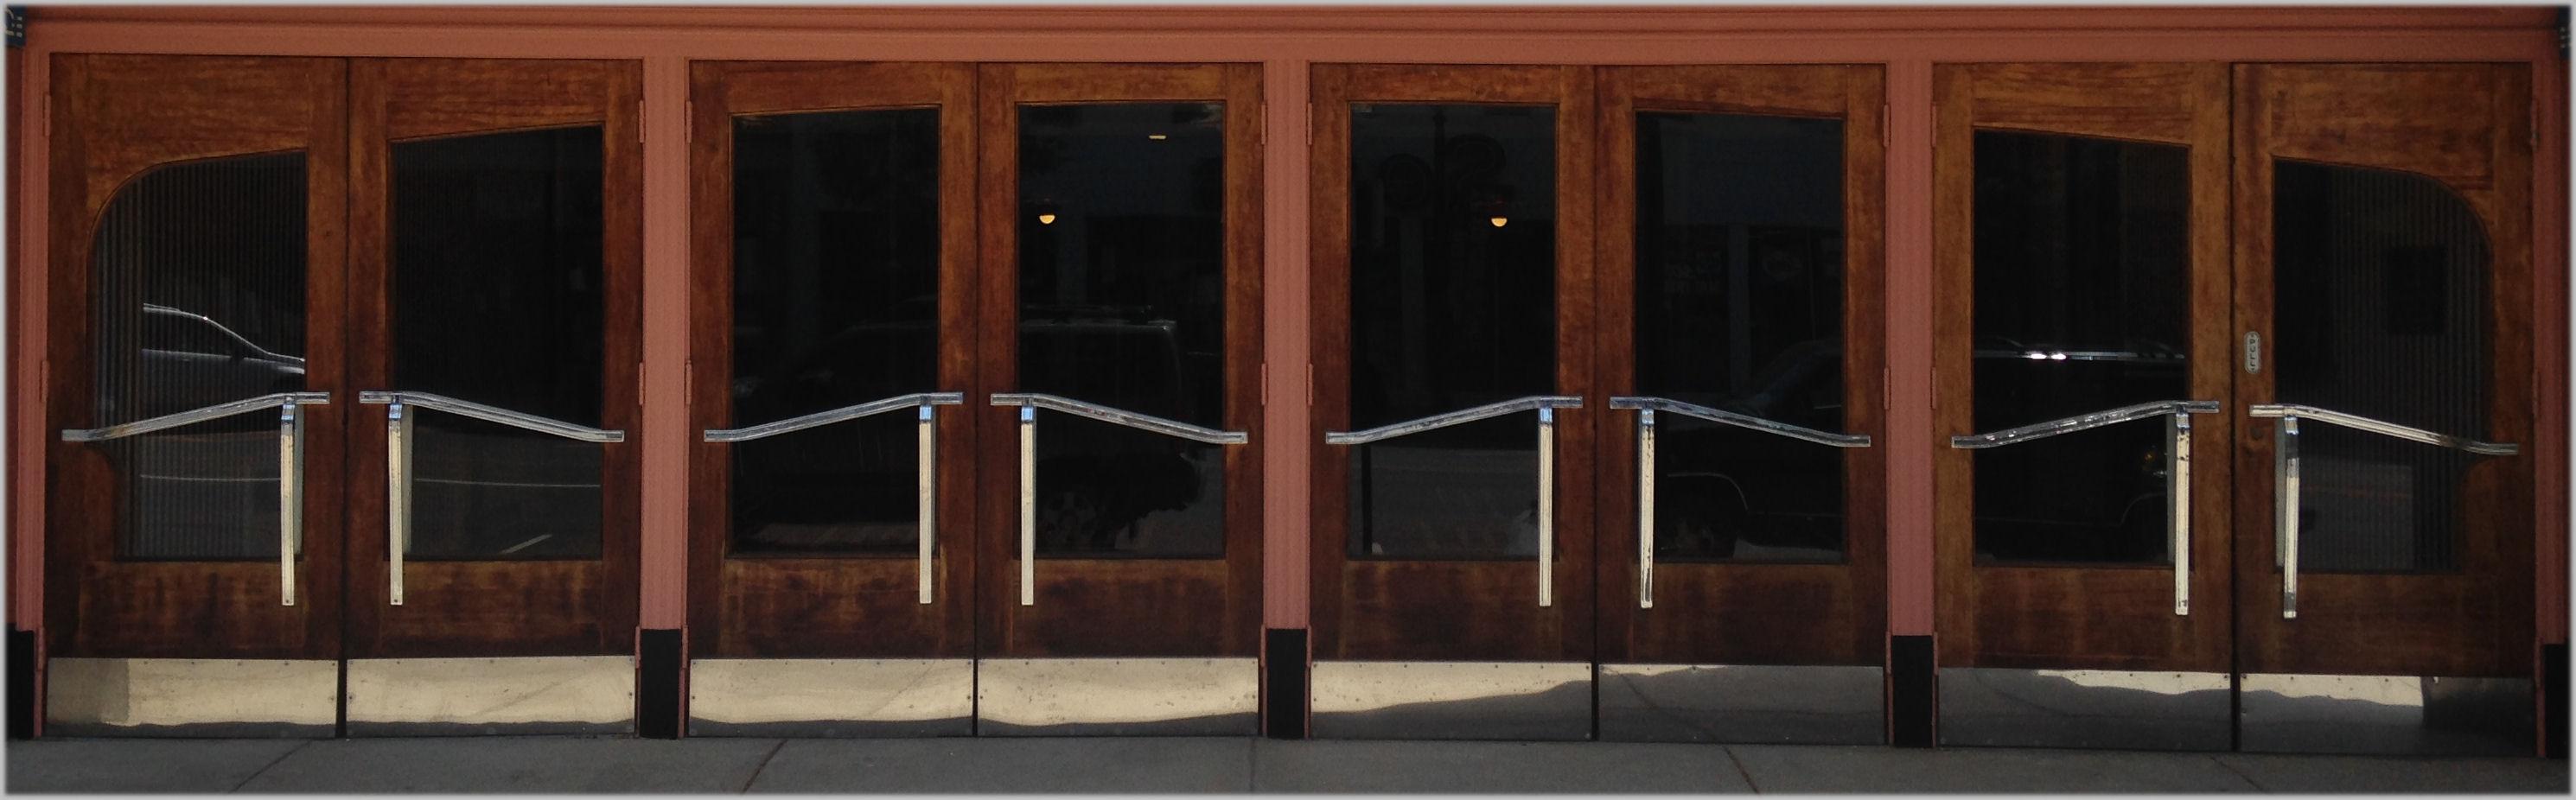 FileNorwalk Theatre Doors.jpg & File:Norwalk Theatre Doors.jpg - Wikimedia Commons pezcame.com